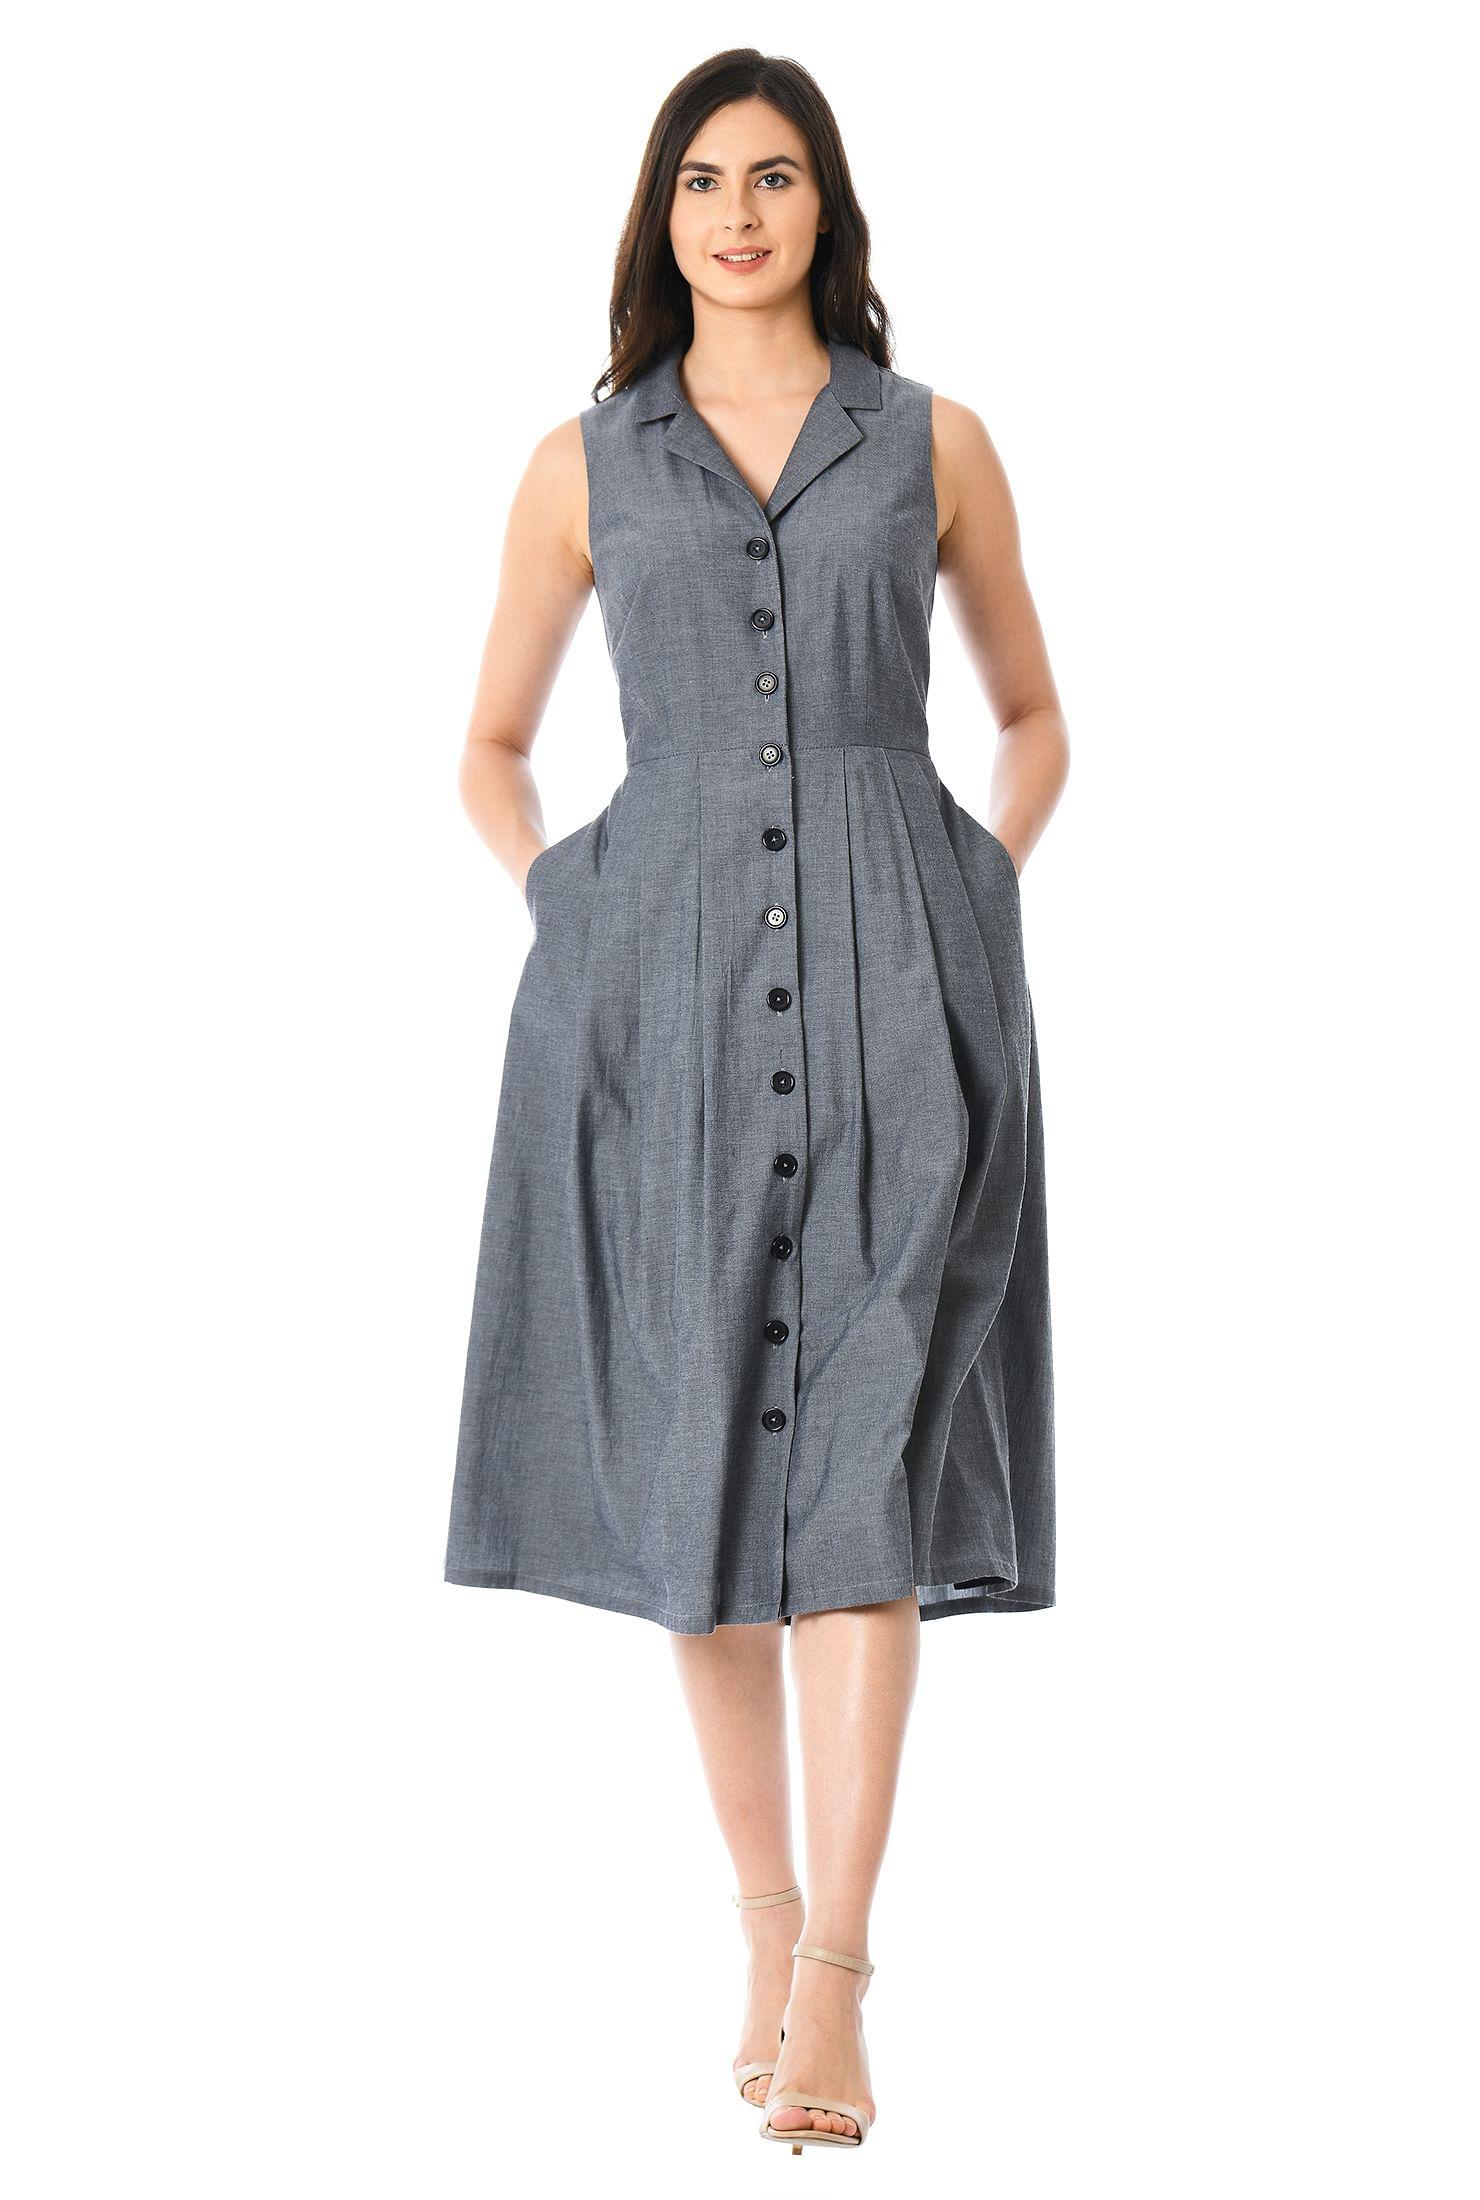 621cc475fc487 Women's Fashion Clothing 0-36W and Custom